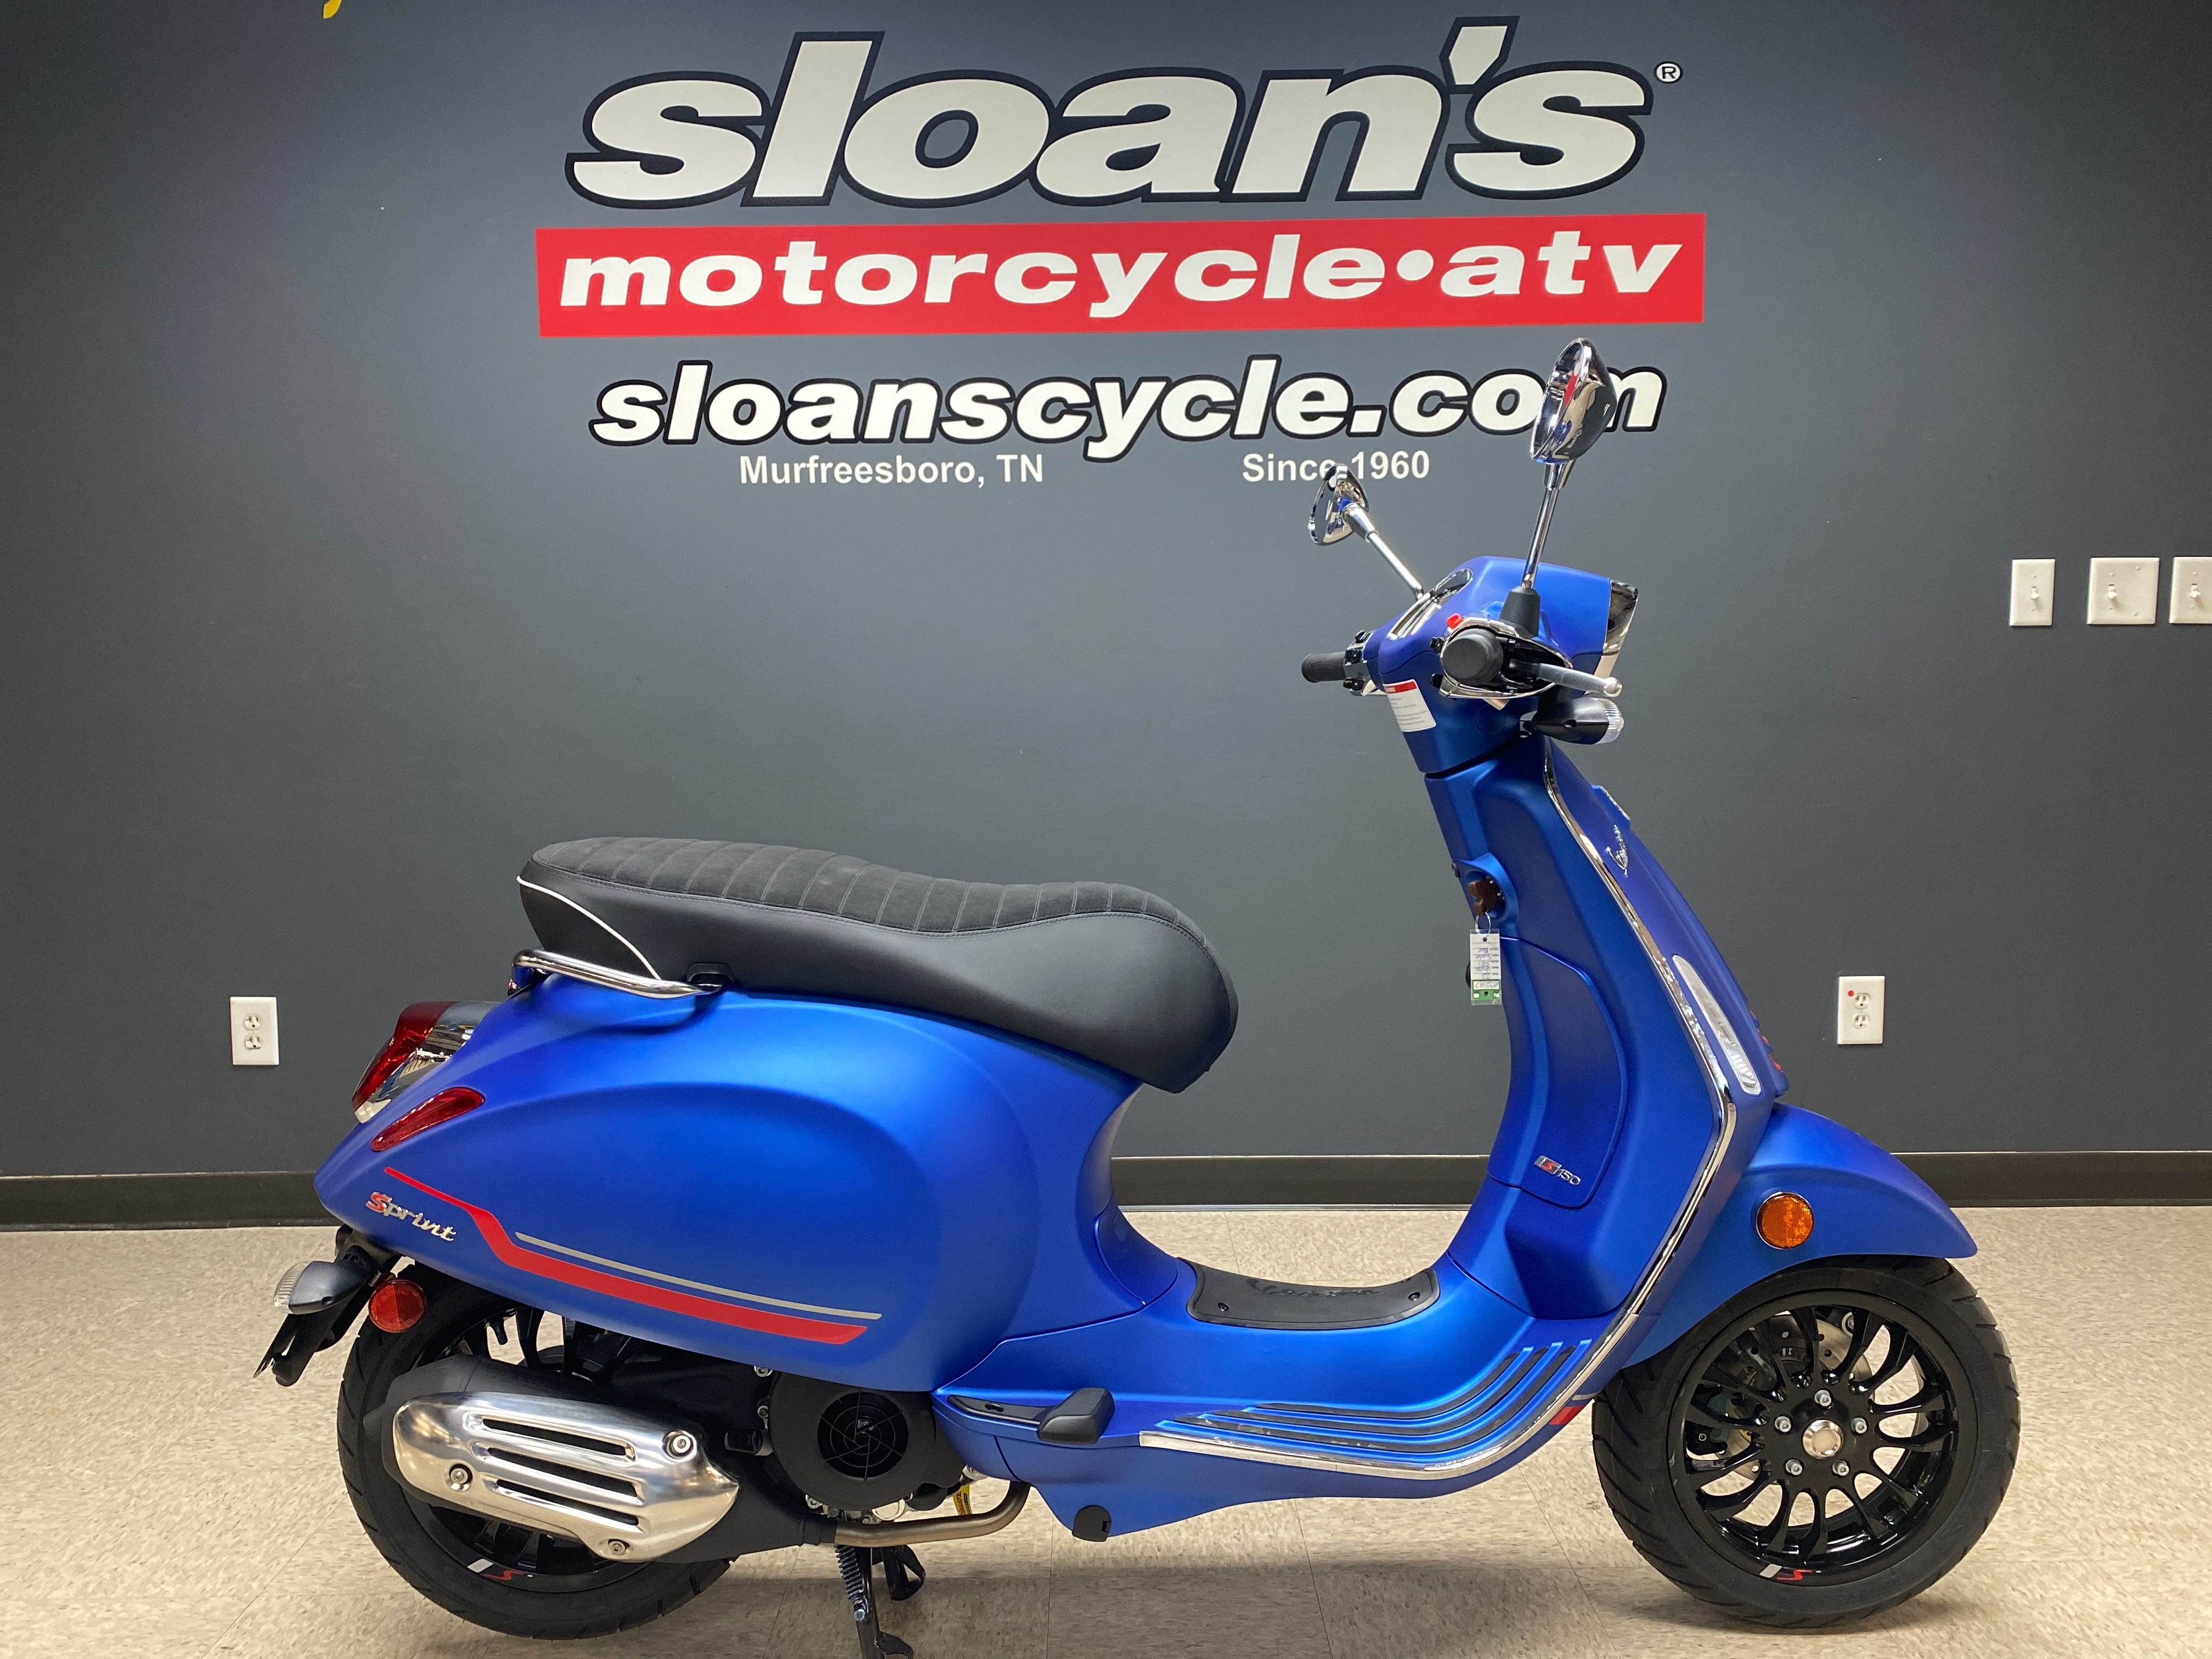 2021 Vespa SPRINT S 150 SPRINT S 150 at Sloans Motorcycle ATV, Murfreesboro, TN, 37129